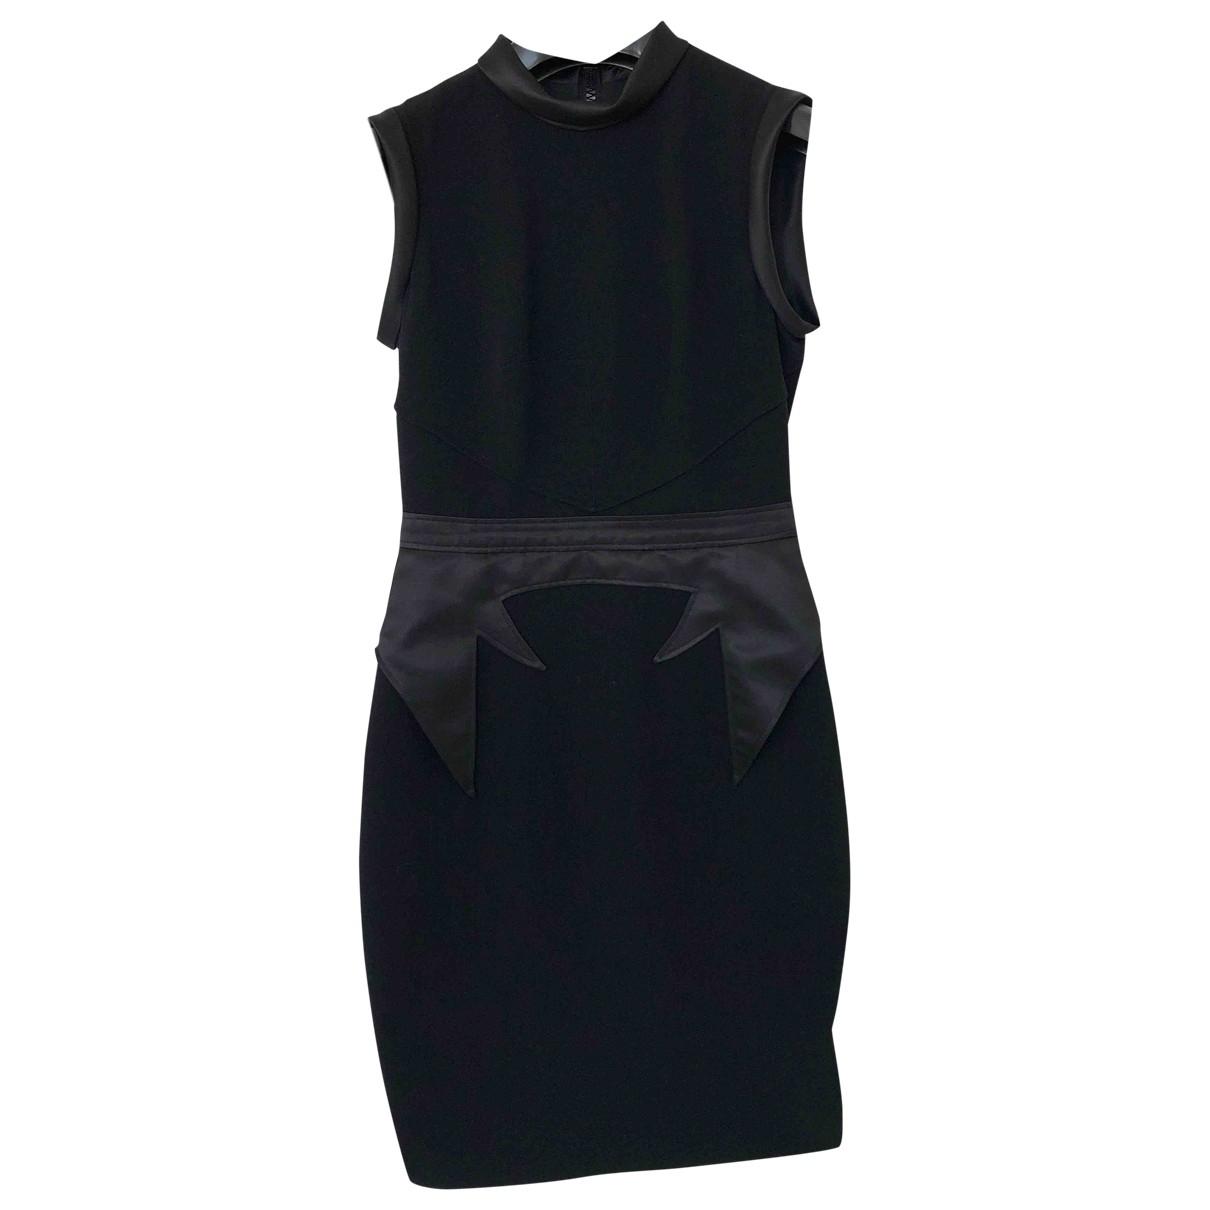 Givenchy \N Black Wool dress for Women 40 FR